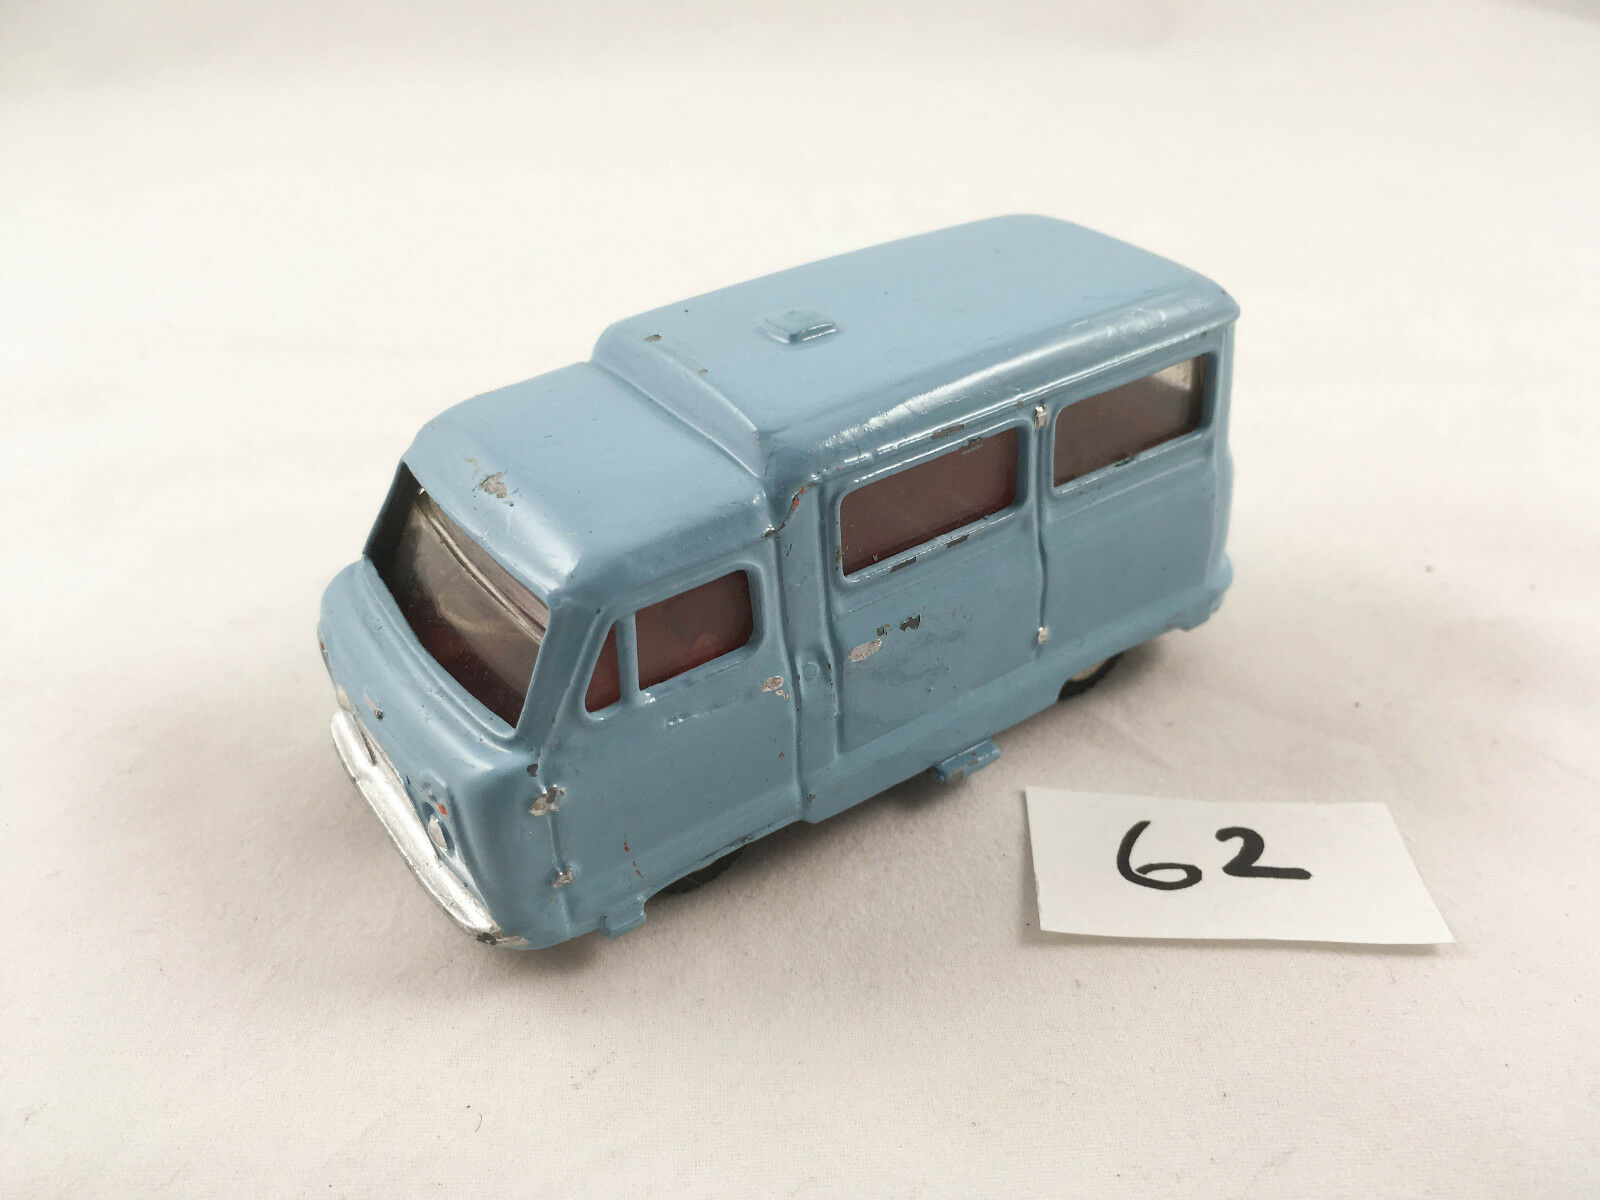 DINKY TOYS   295 standard ATLAS kenebrake Bus Minibus ORIGINALE Diecast riverniciata